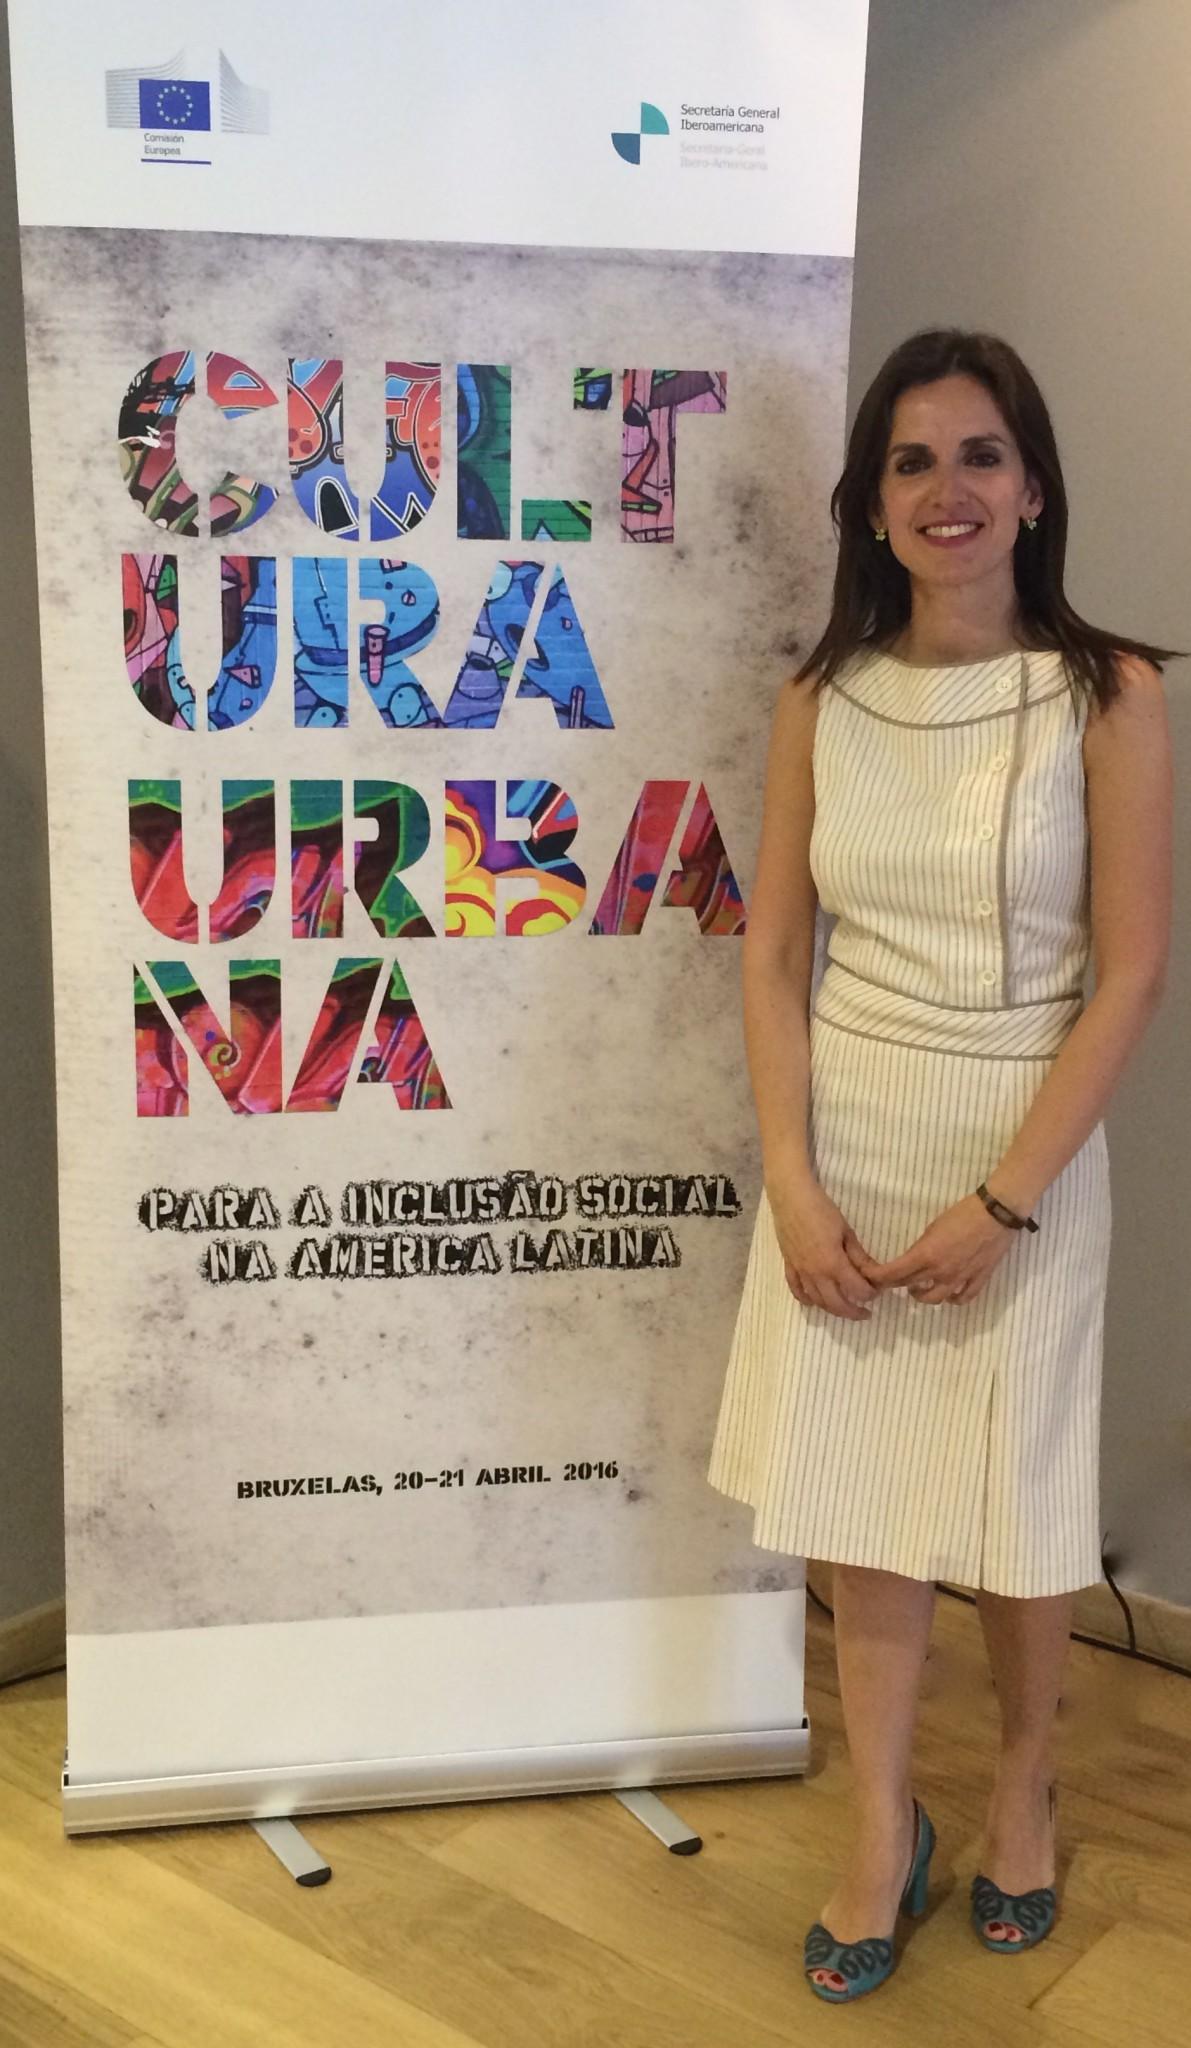 European Commission Cultura Urbana